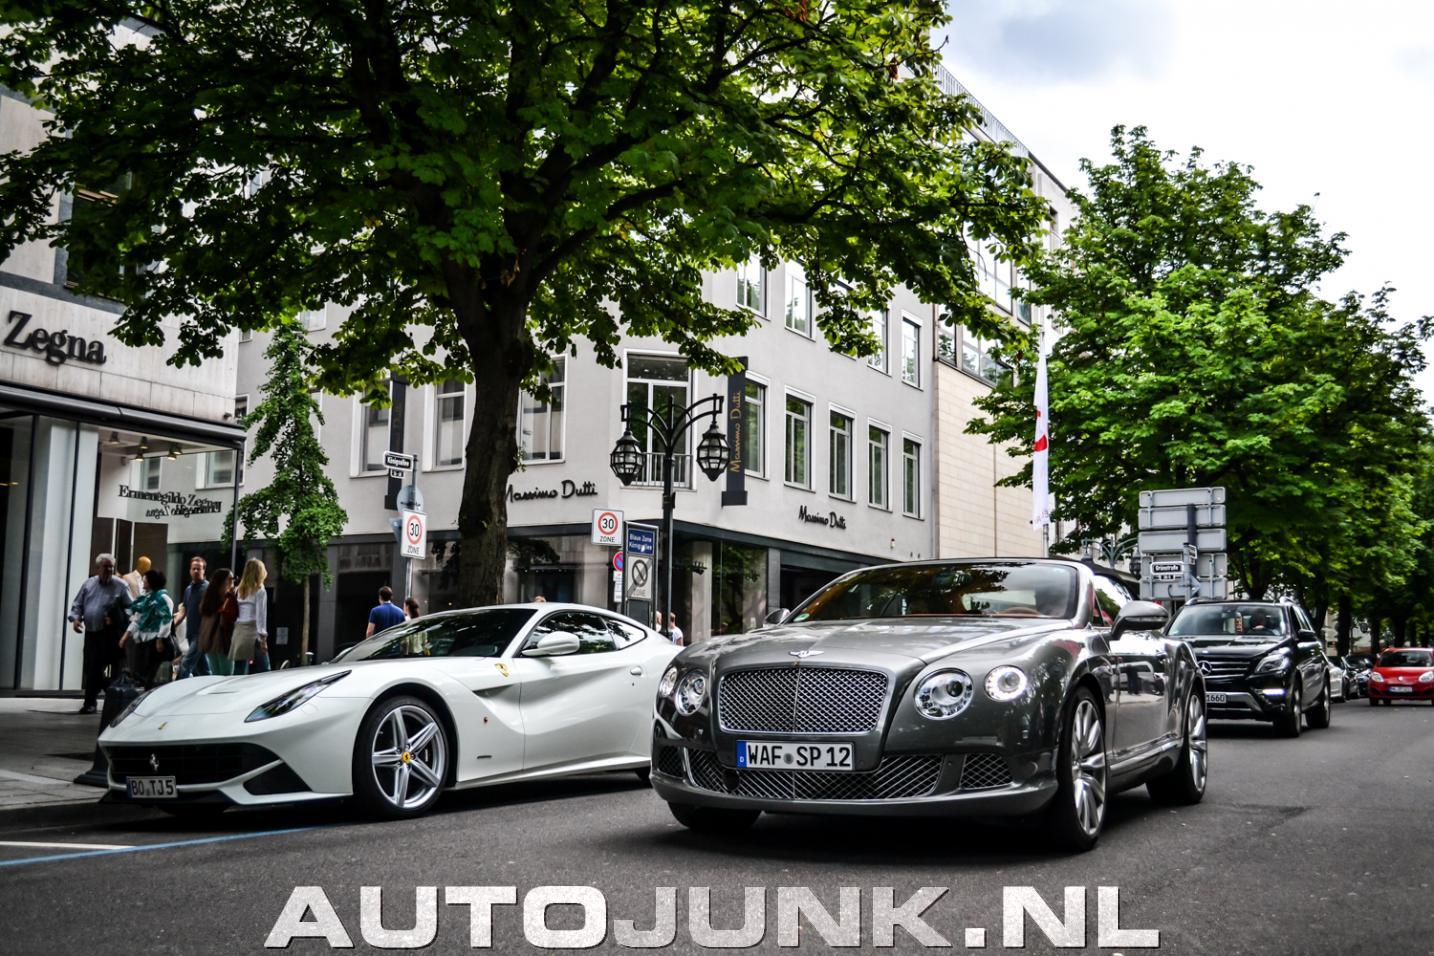 Gt automobile d sseldorf autohaus gt d sseldorf in d sseldorf mercedes amg gt s spotted in d - Gebrauchte buromobel dusseldorf ...